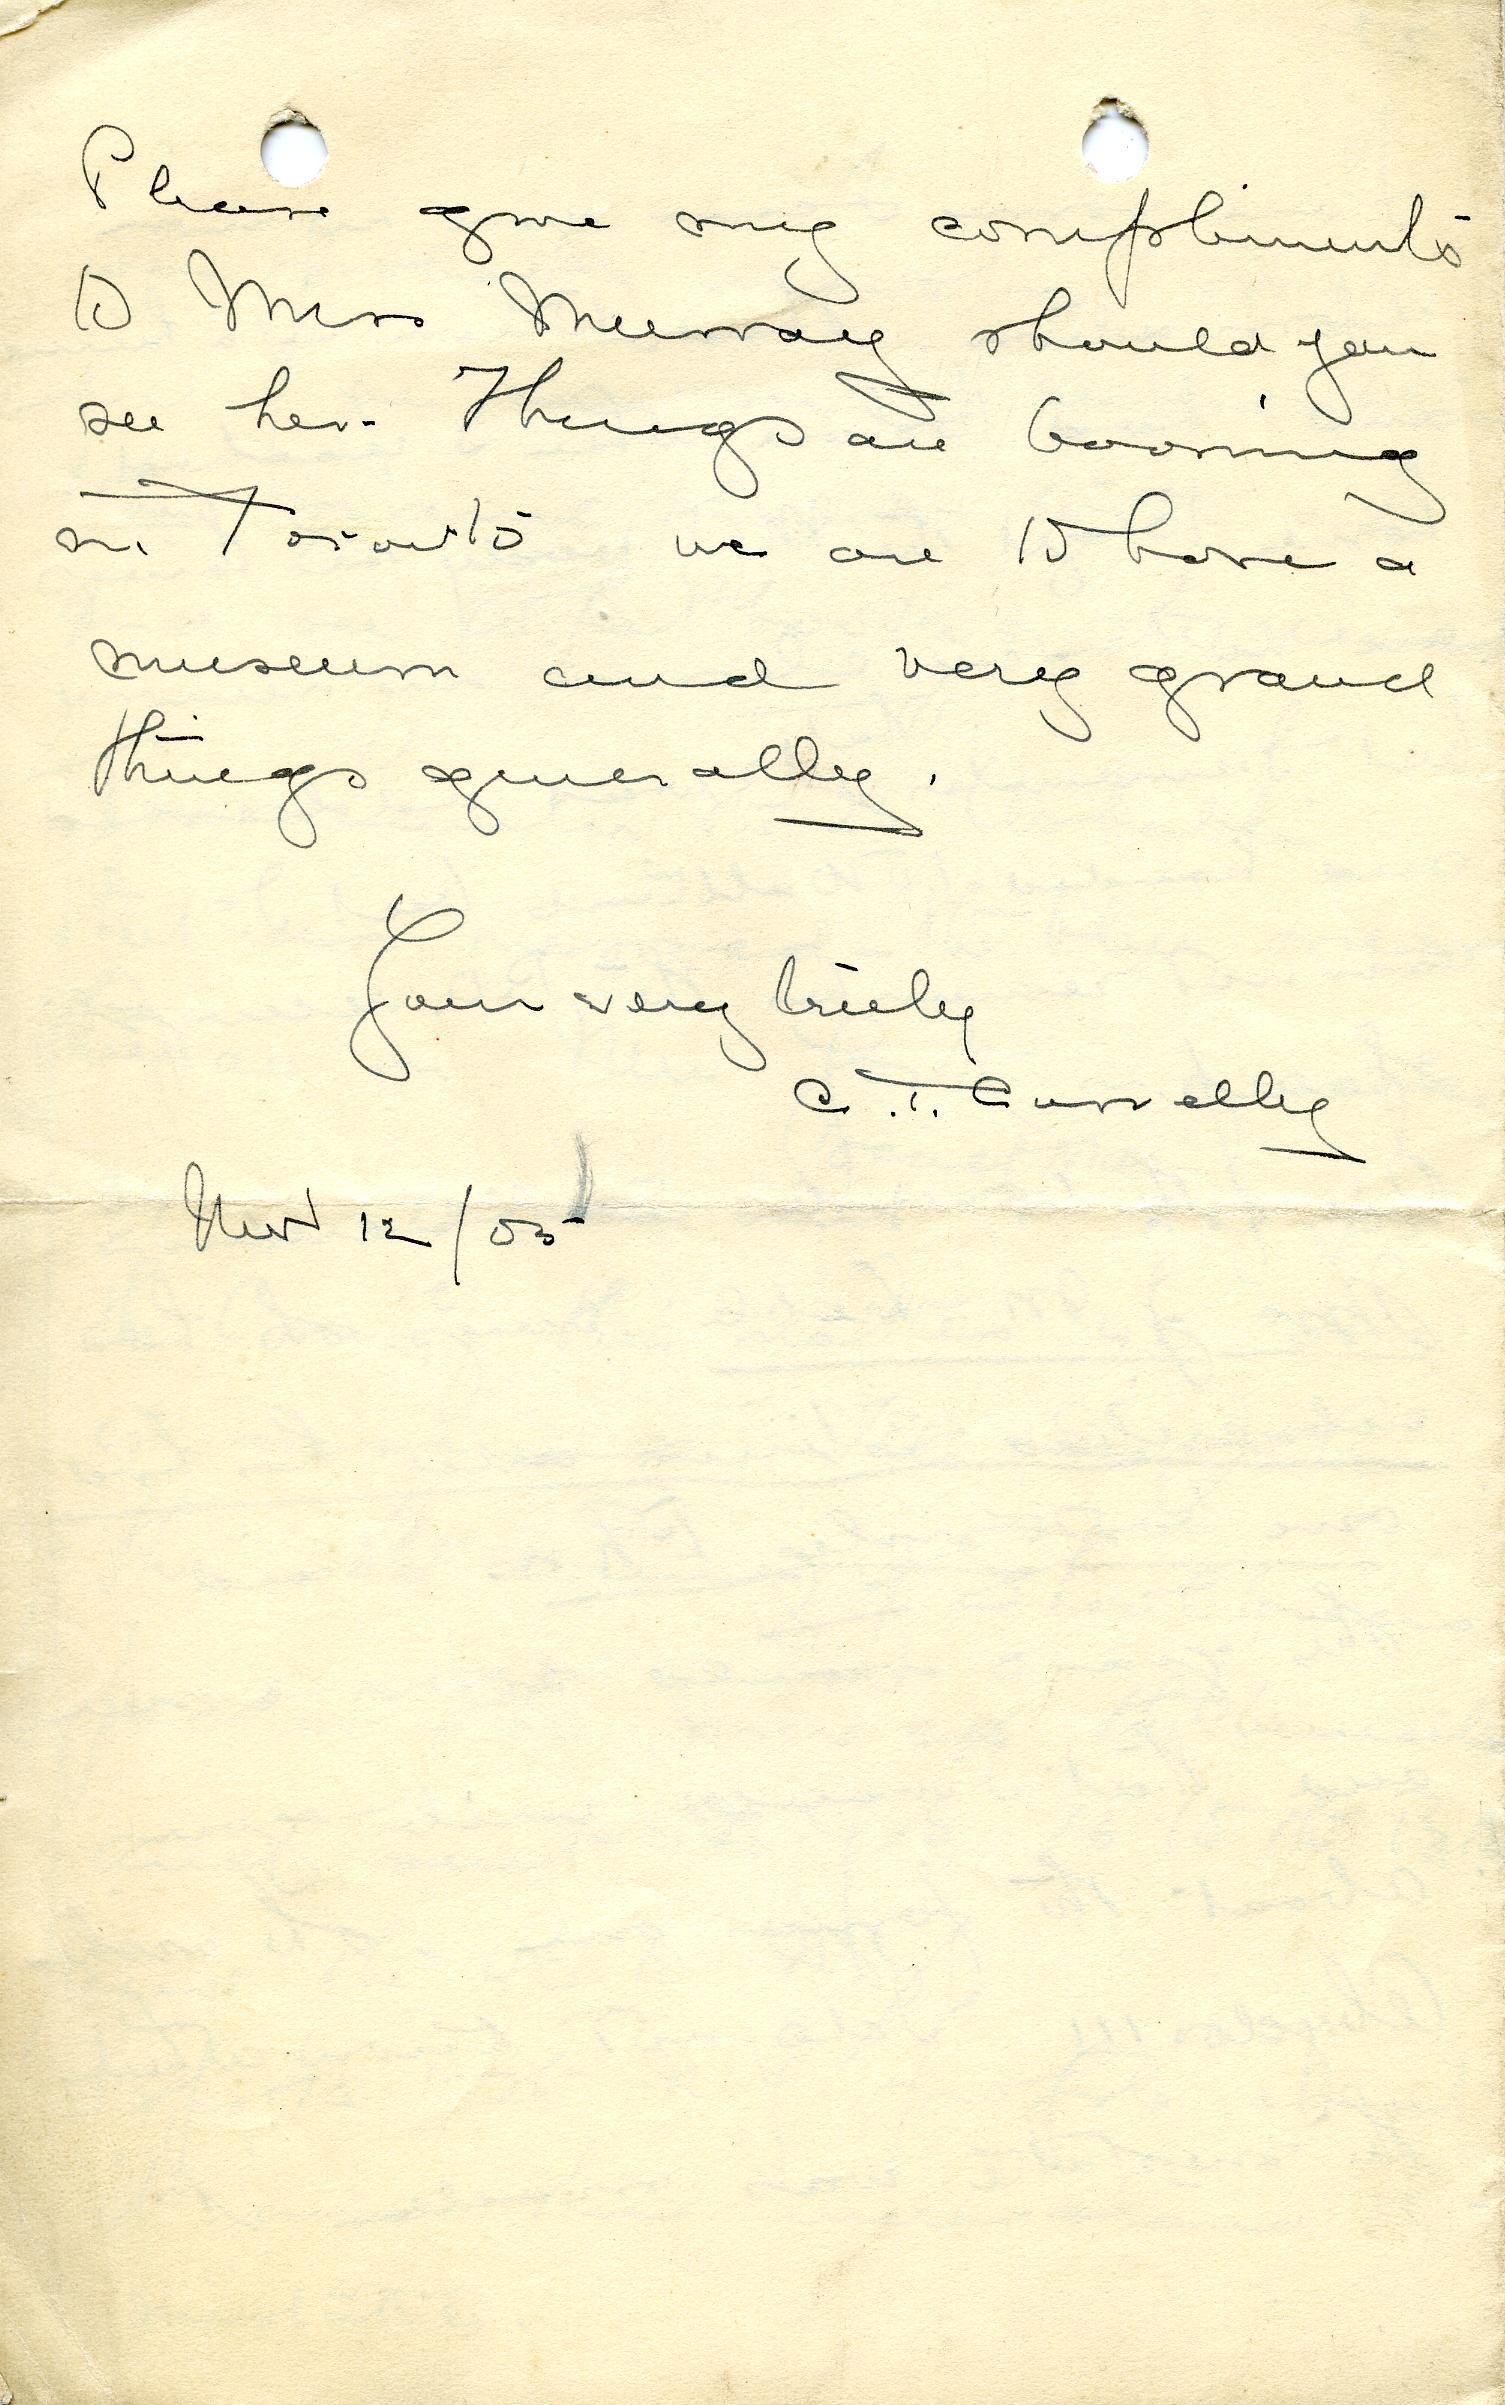 1904-05 Sinai, Deir el-Bahri, Oxyrhynchus, Naukratis DIST.23.26c